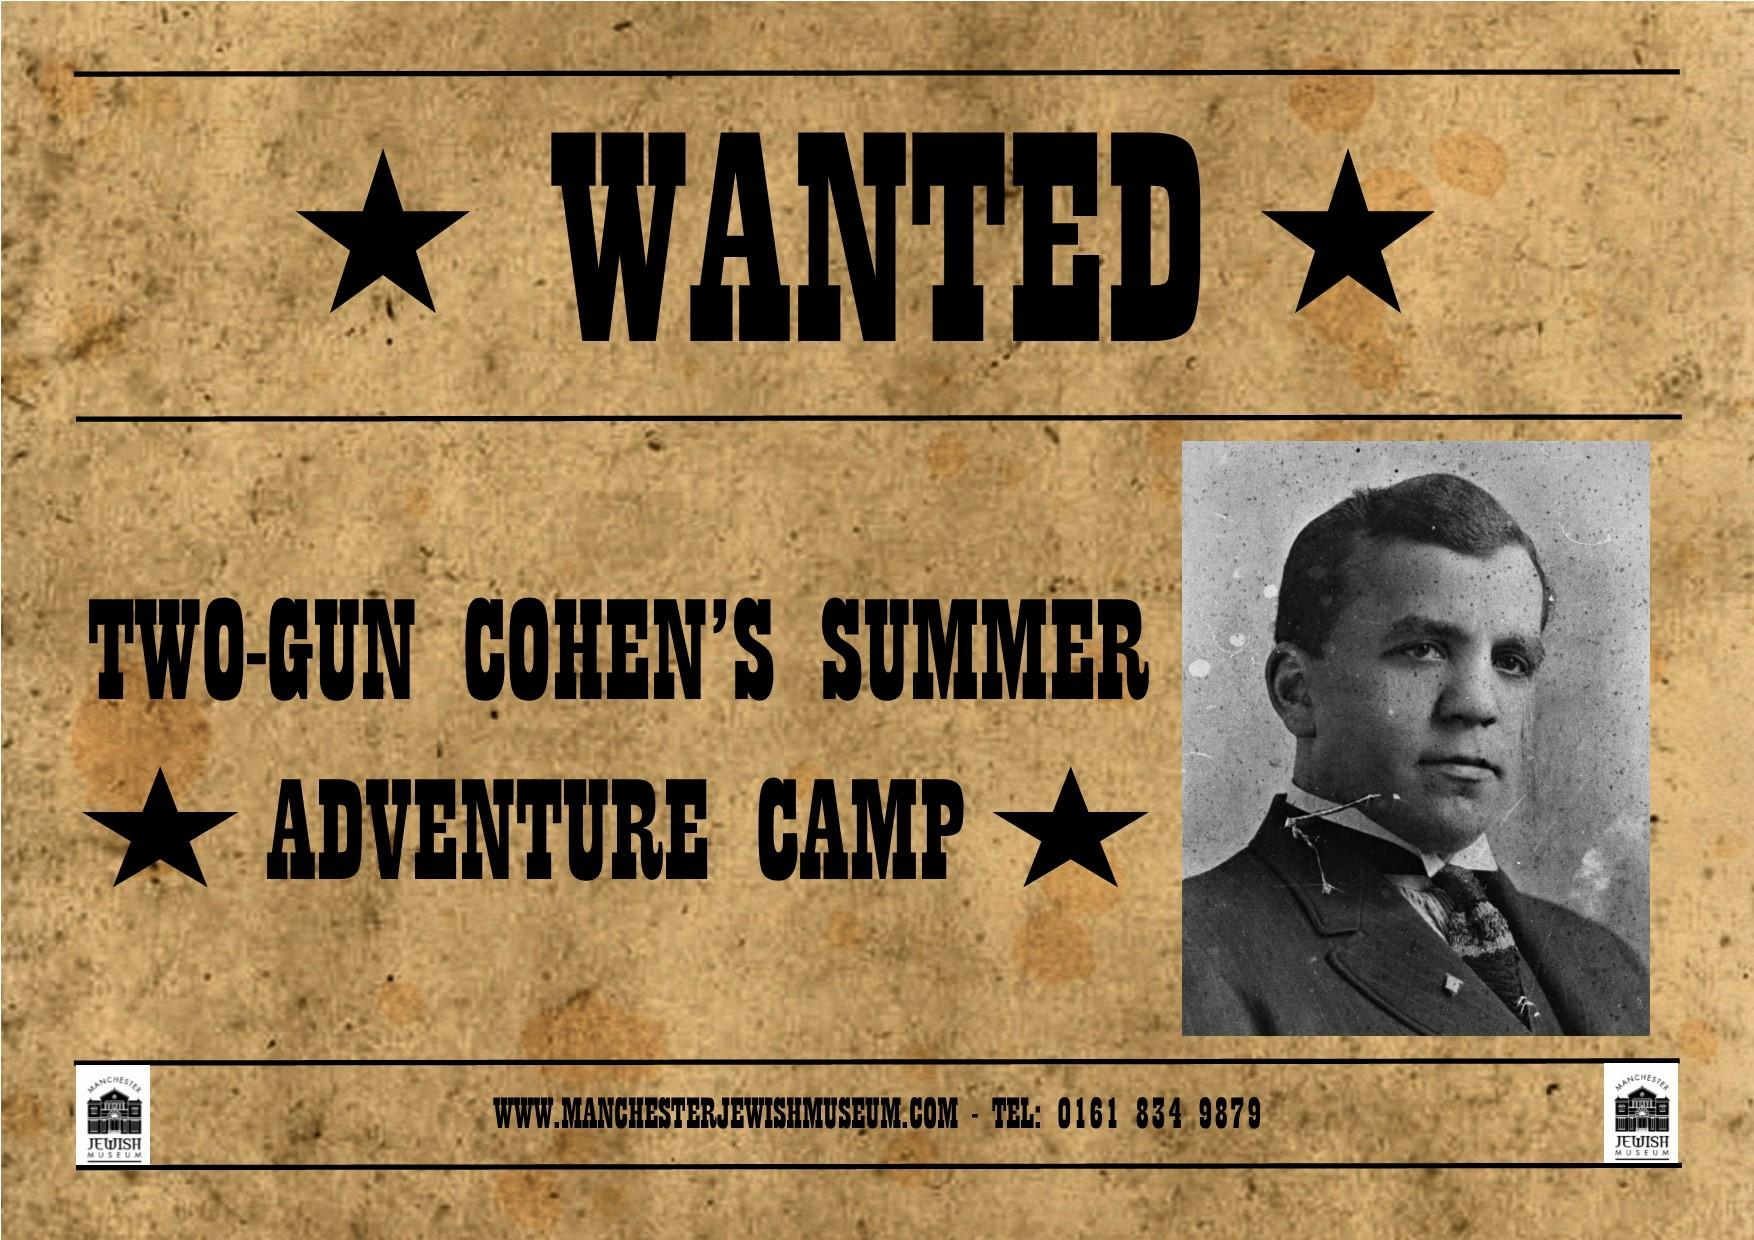 Two-Gun Cohen's Summer Adventure Camp